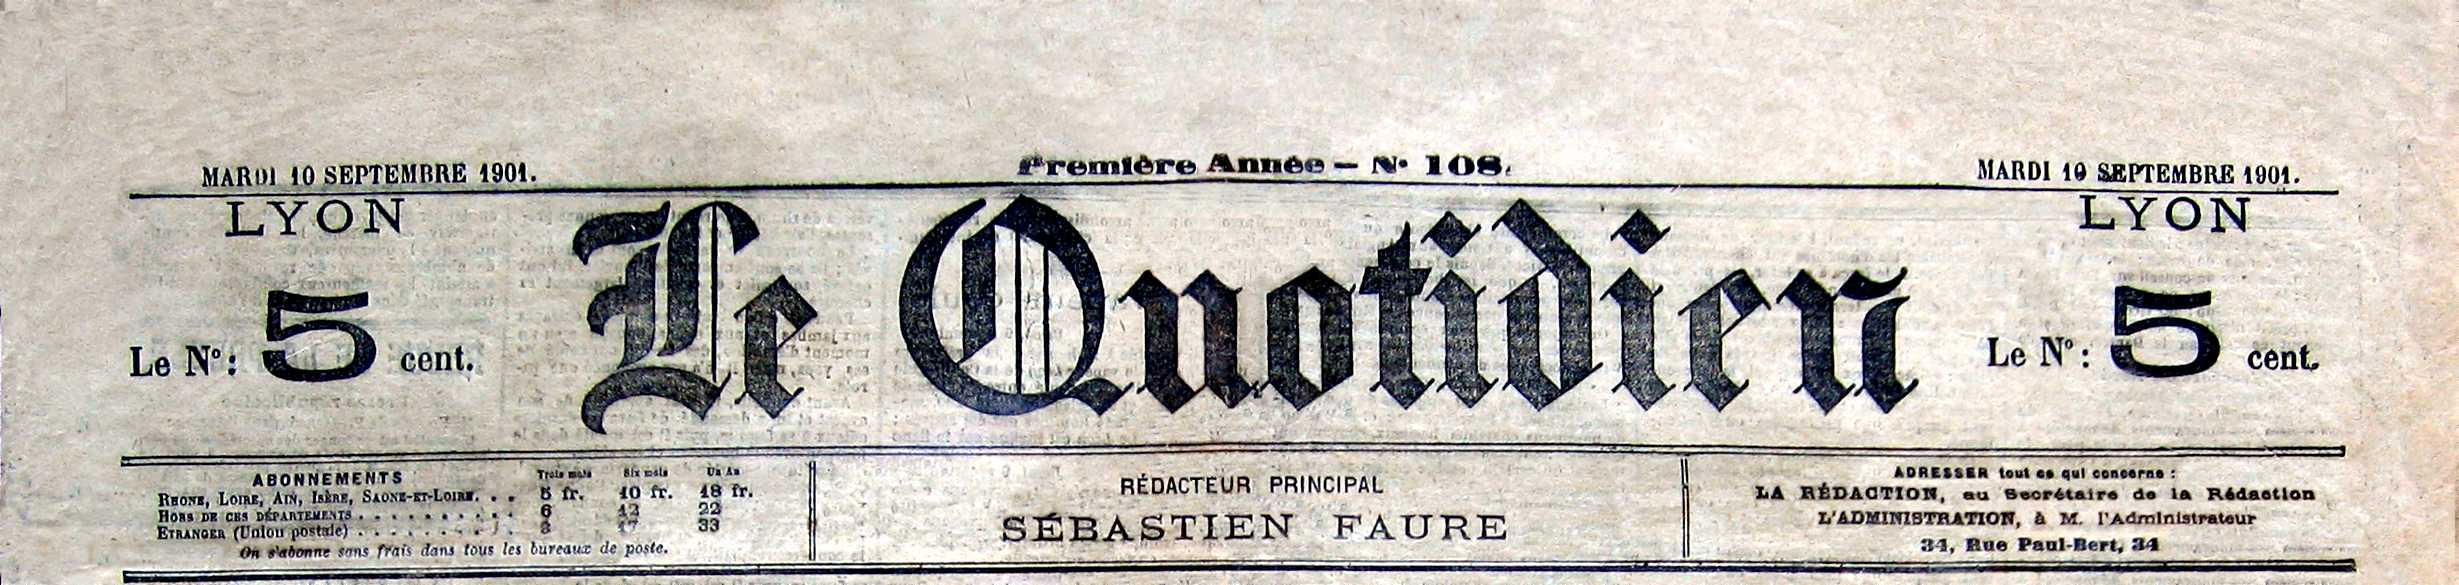 "Capçalera de ""Le Quotidien"" [CIRA-Lausana] Foto: Éric B. Coulaud"